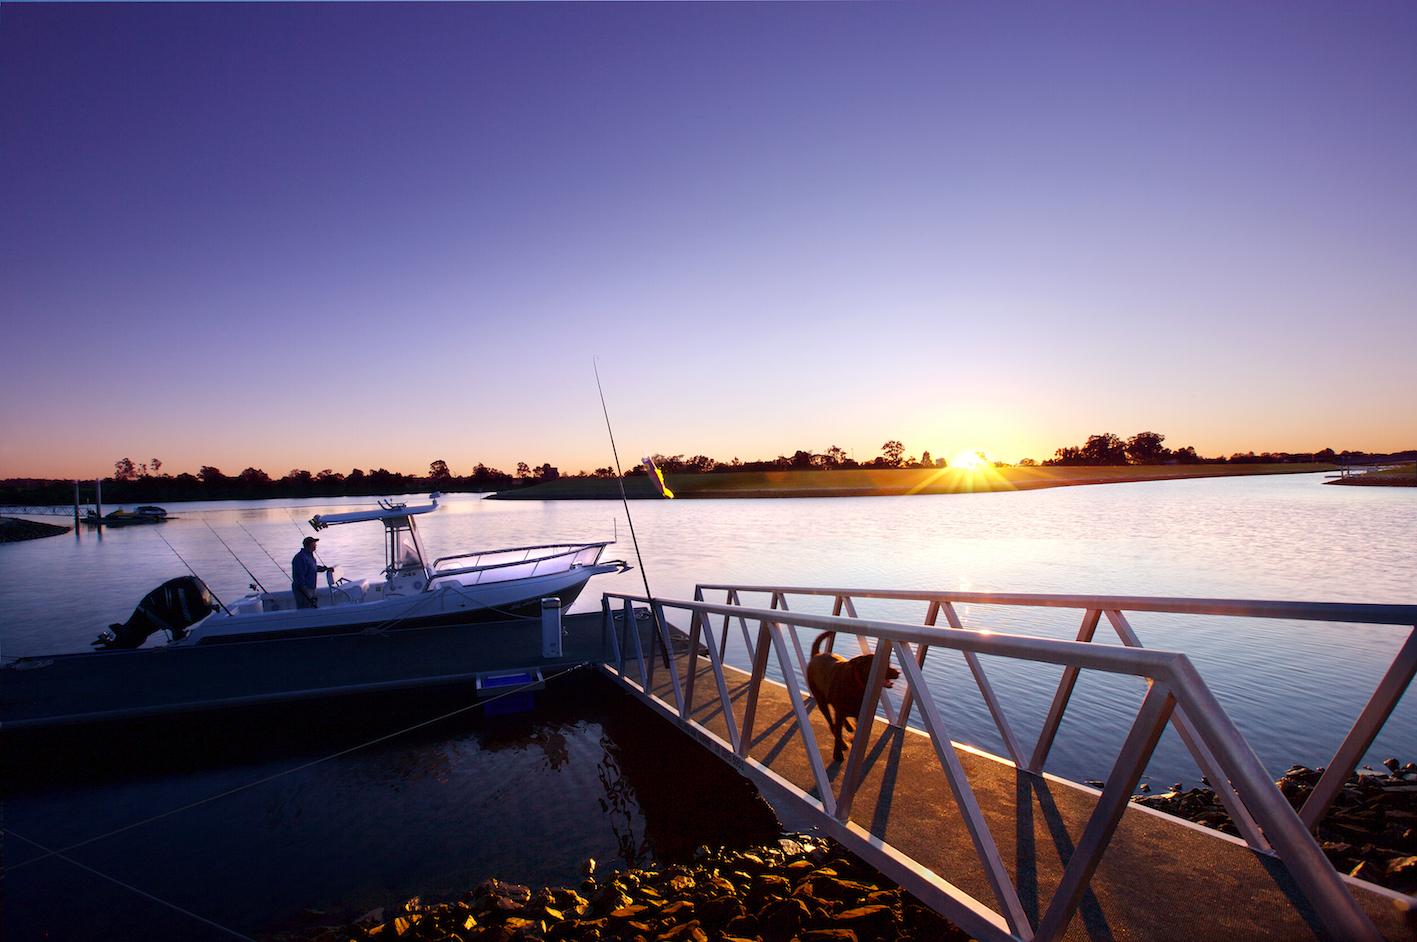 Man, boat, dog, pontoon